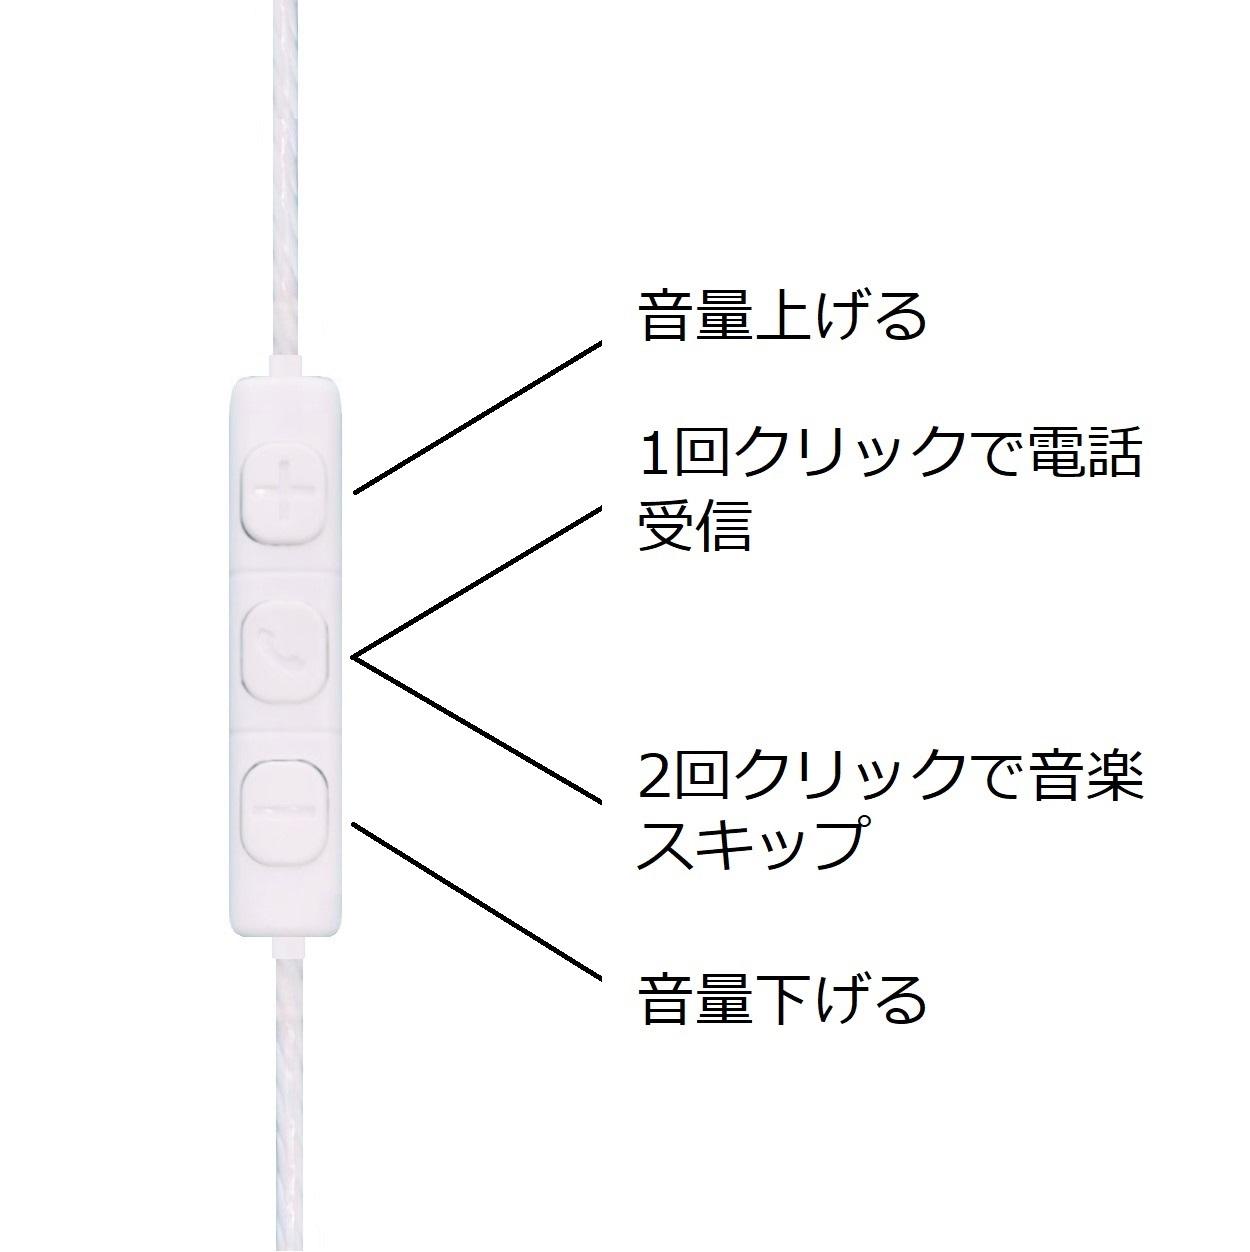 JapanVolumeControl